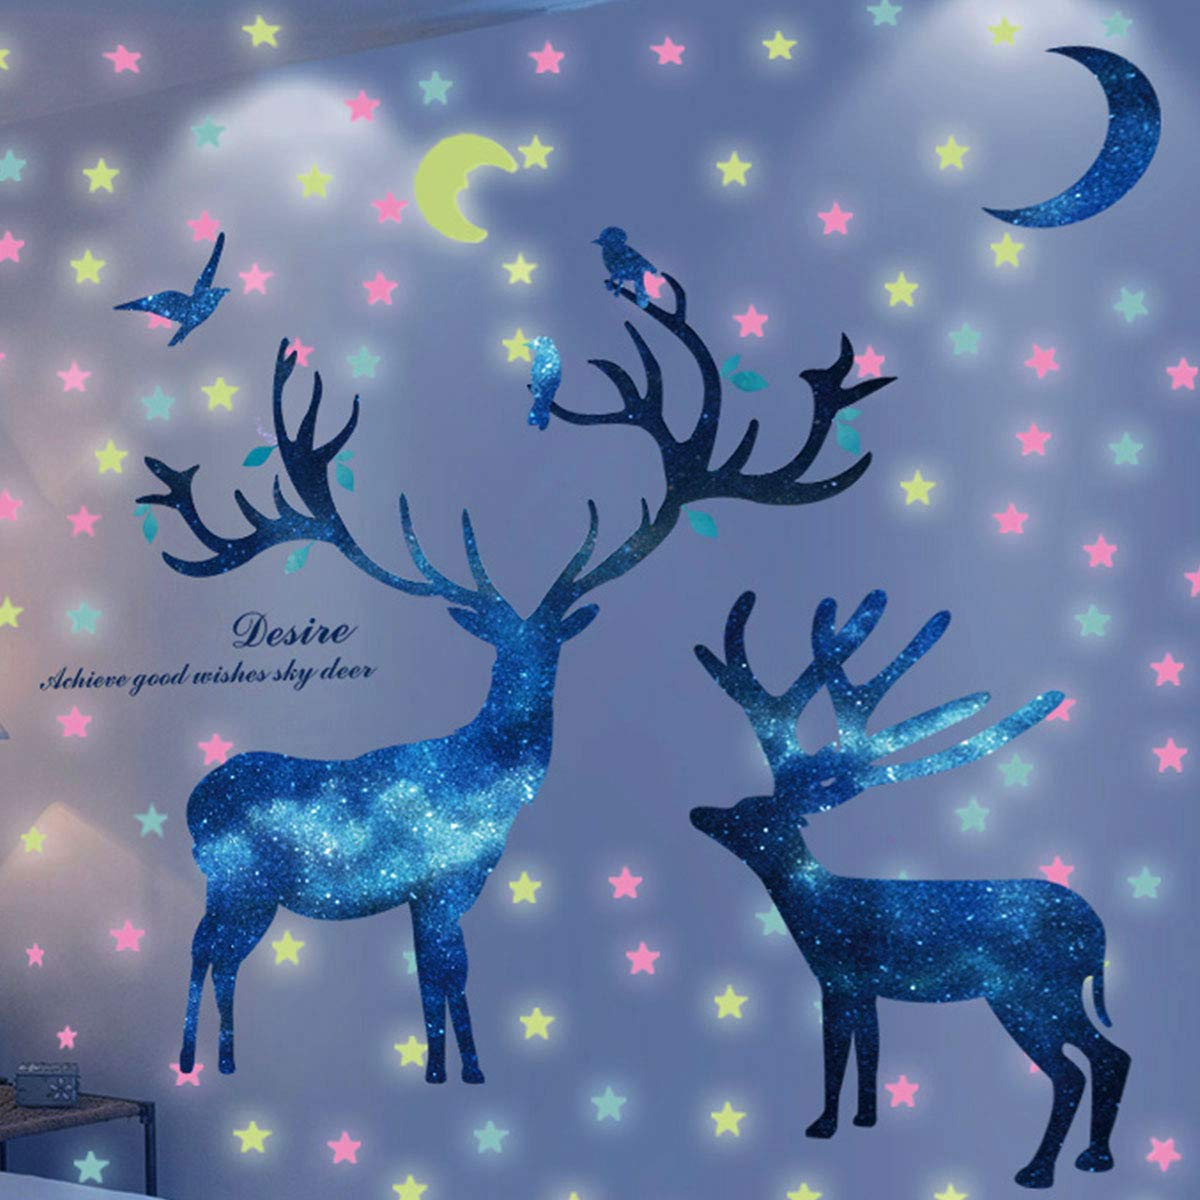 HO BEAR Starry Deer Wall Decor Sticker with Glow Moon Star Stickers Room Decor Murals Teen Bedroom Wall Decals